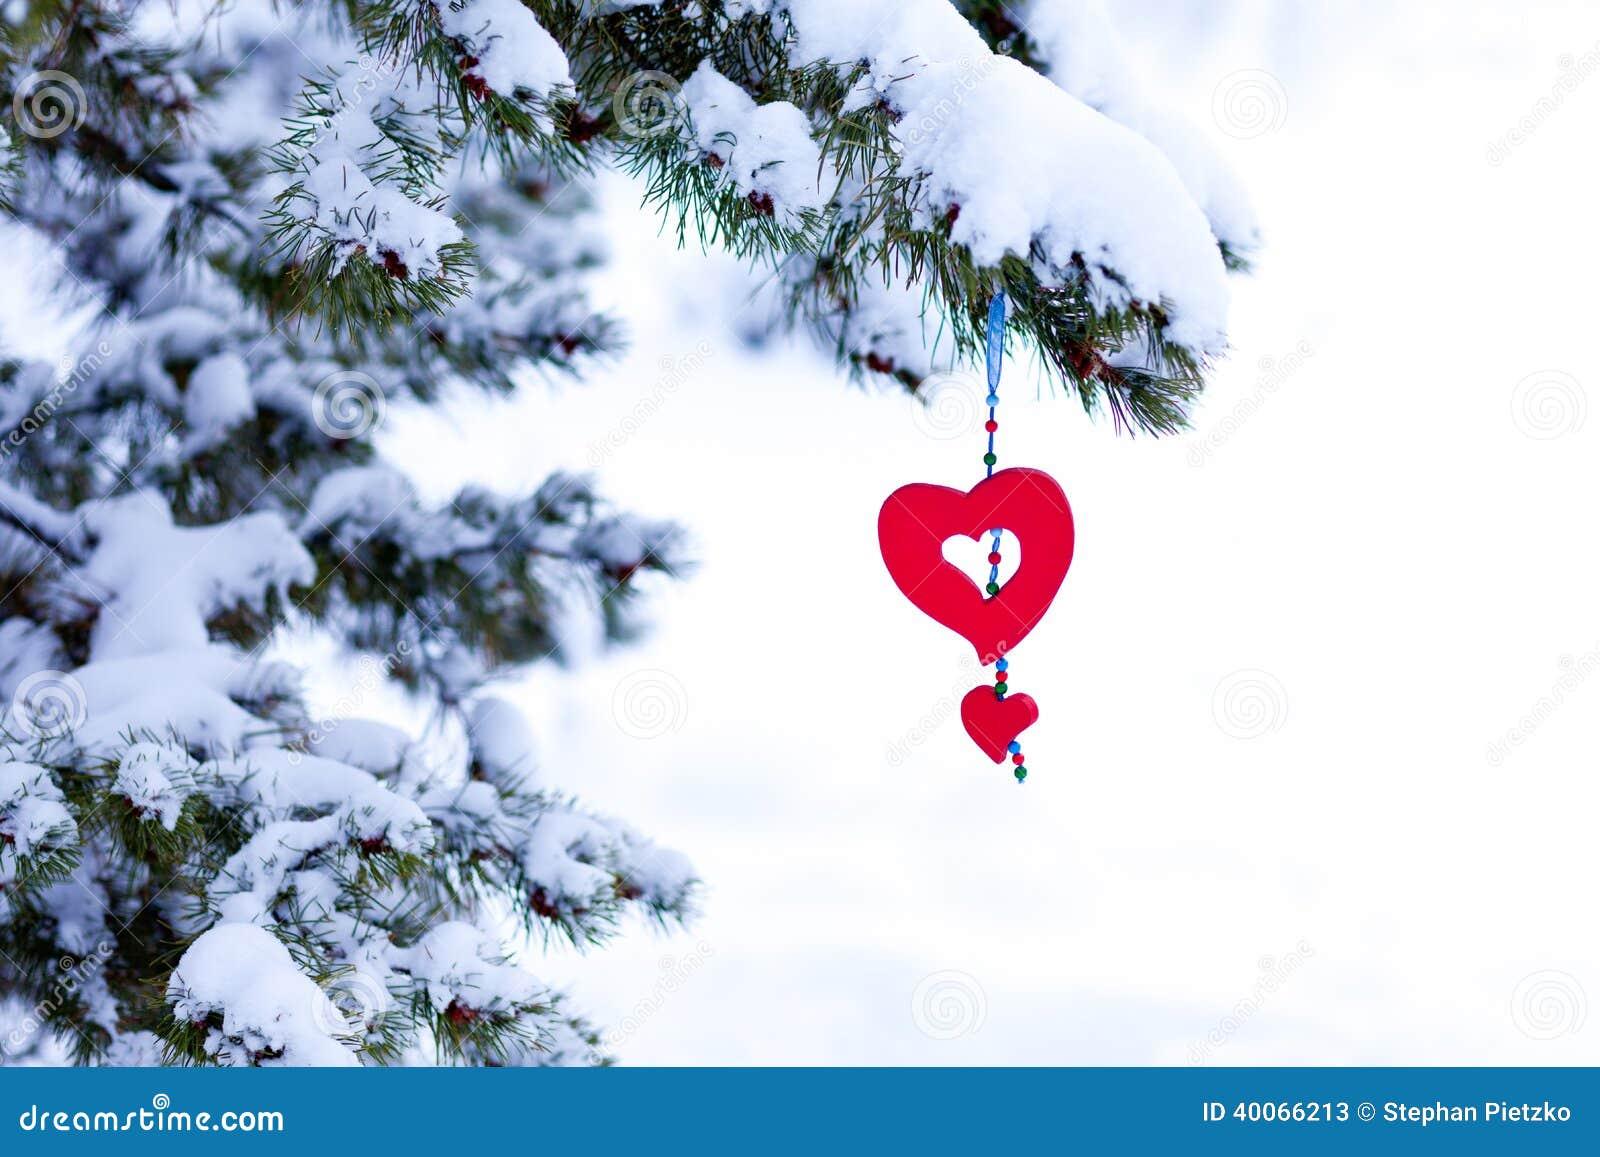 Snowy Christmas Tree Red Heart Ornament Stock Photo